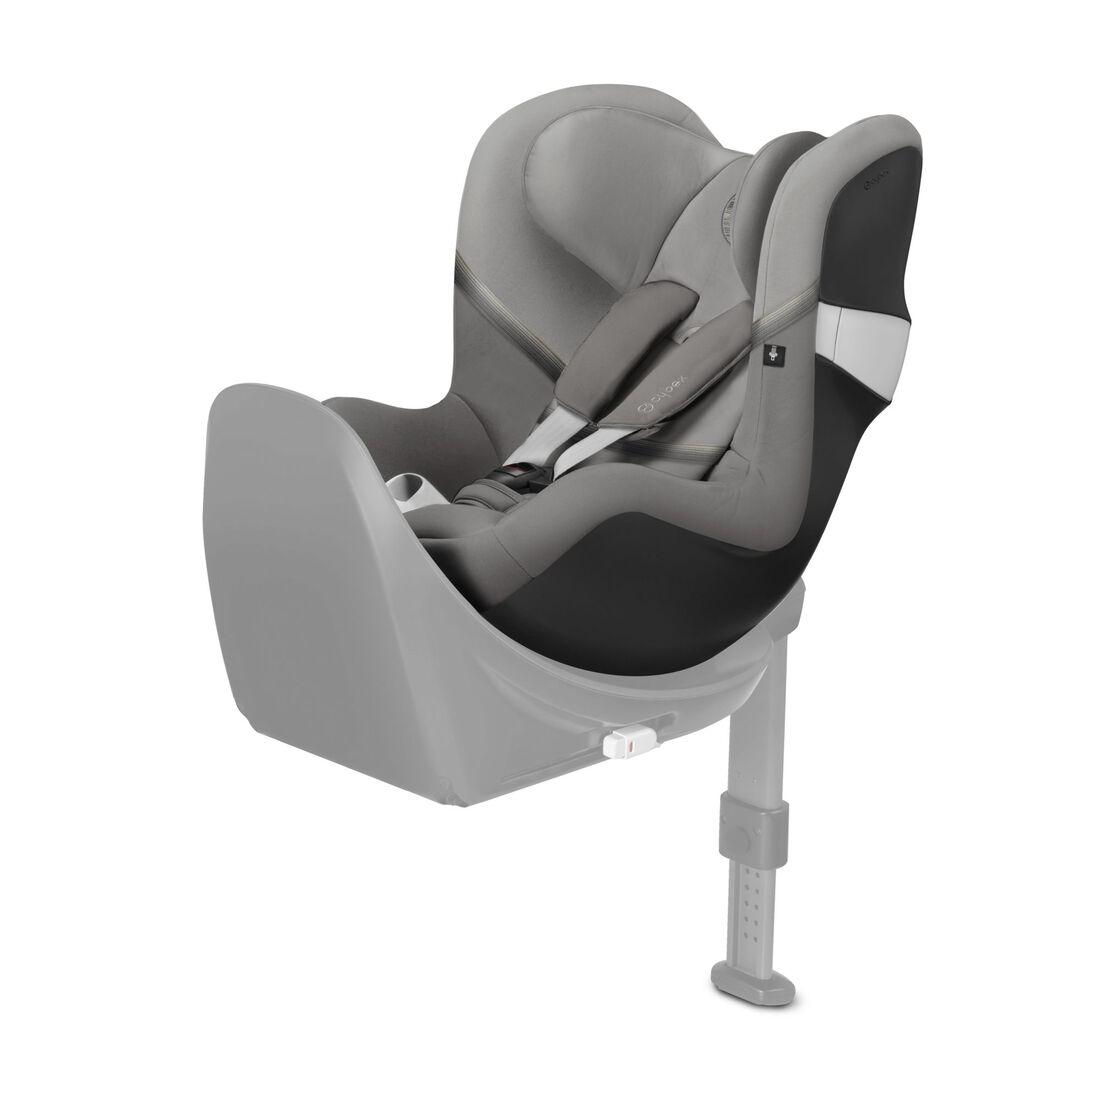 CYBEX Sirona M2 i-Size - Soho Grey in Soho Grey large Bild 1